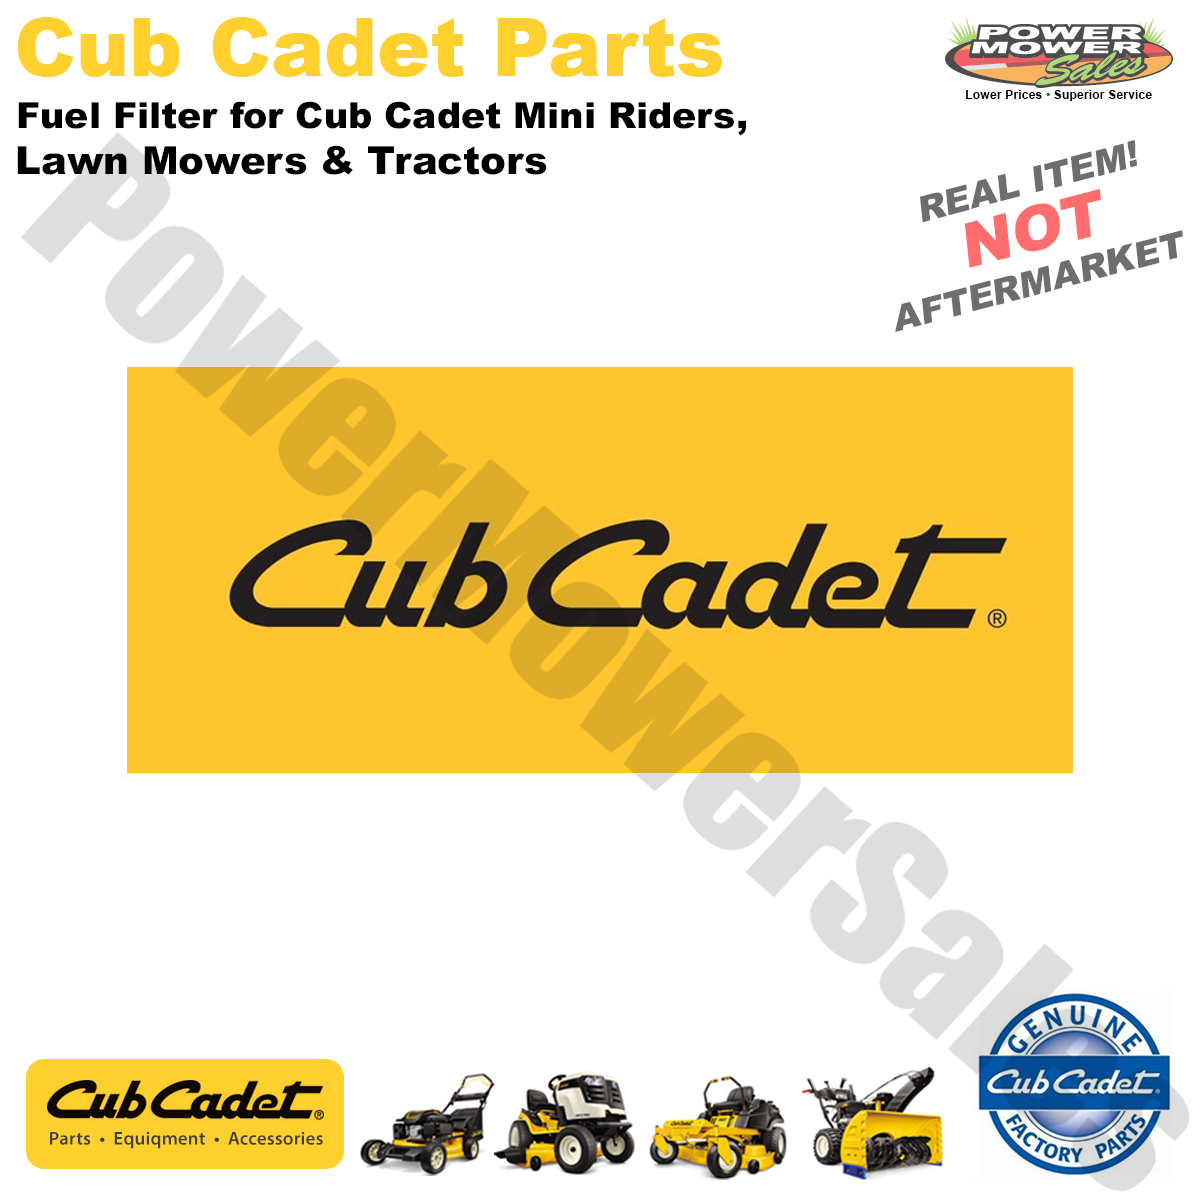 hight resolution of cub cadet mtd troy bilt fuel filter for cub cadet mini riders lawn mowers tractors 951 3013 751 3013